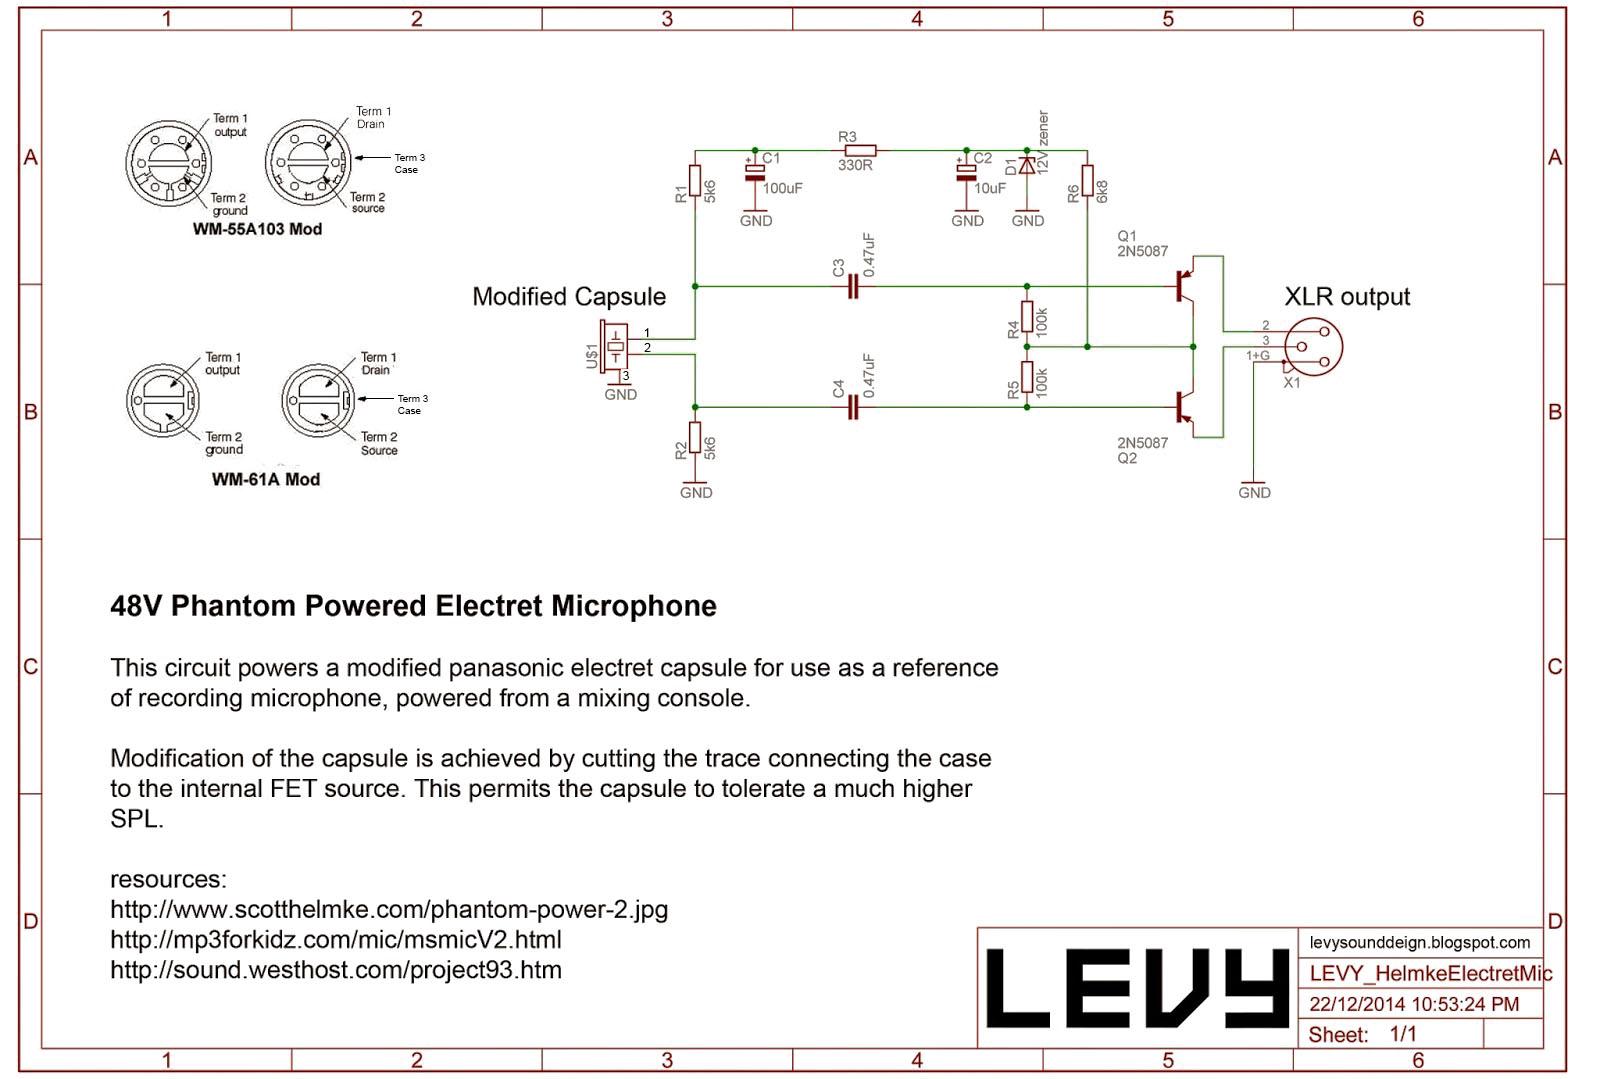 Xlr Wiring Diagram Microphone Stratocaster 5 Way Switch Phantom Power 48v Schematic Diy Elsavadorla